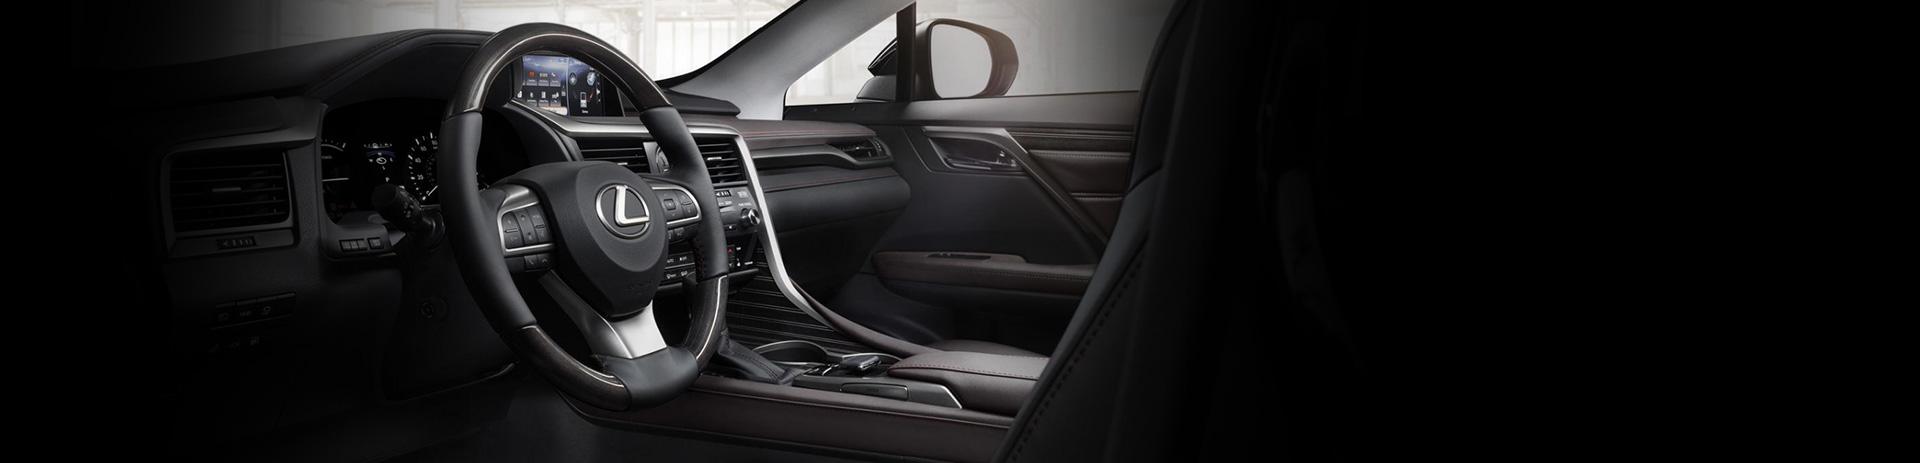 Lexus rx450 td 4 big